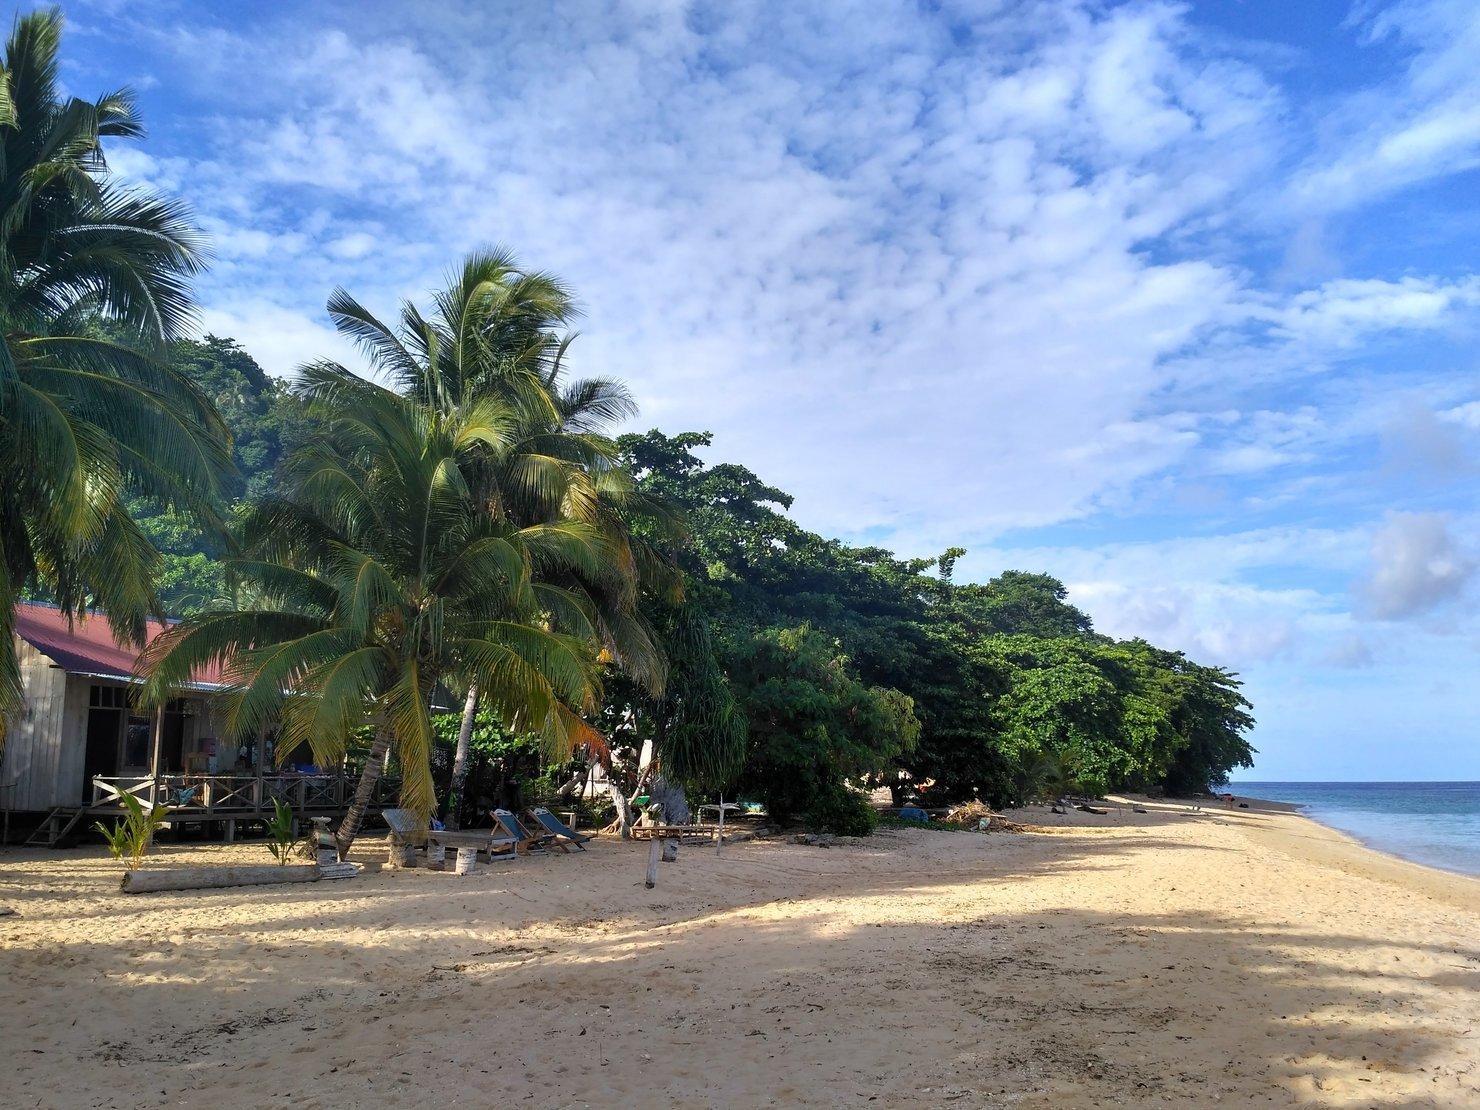 Pulau Hatta